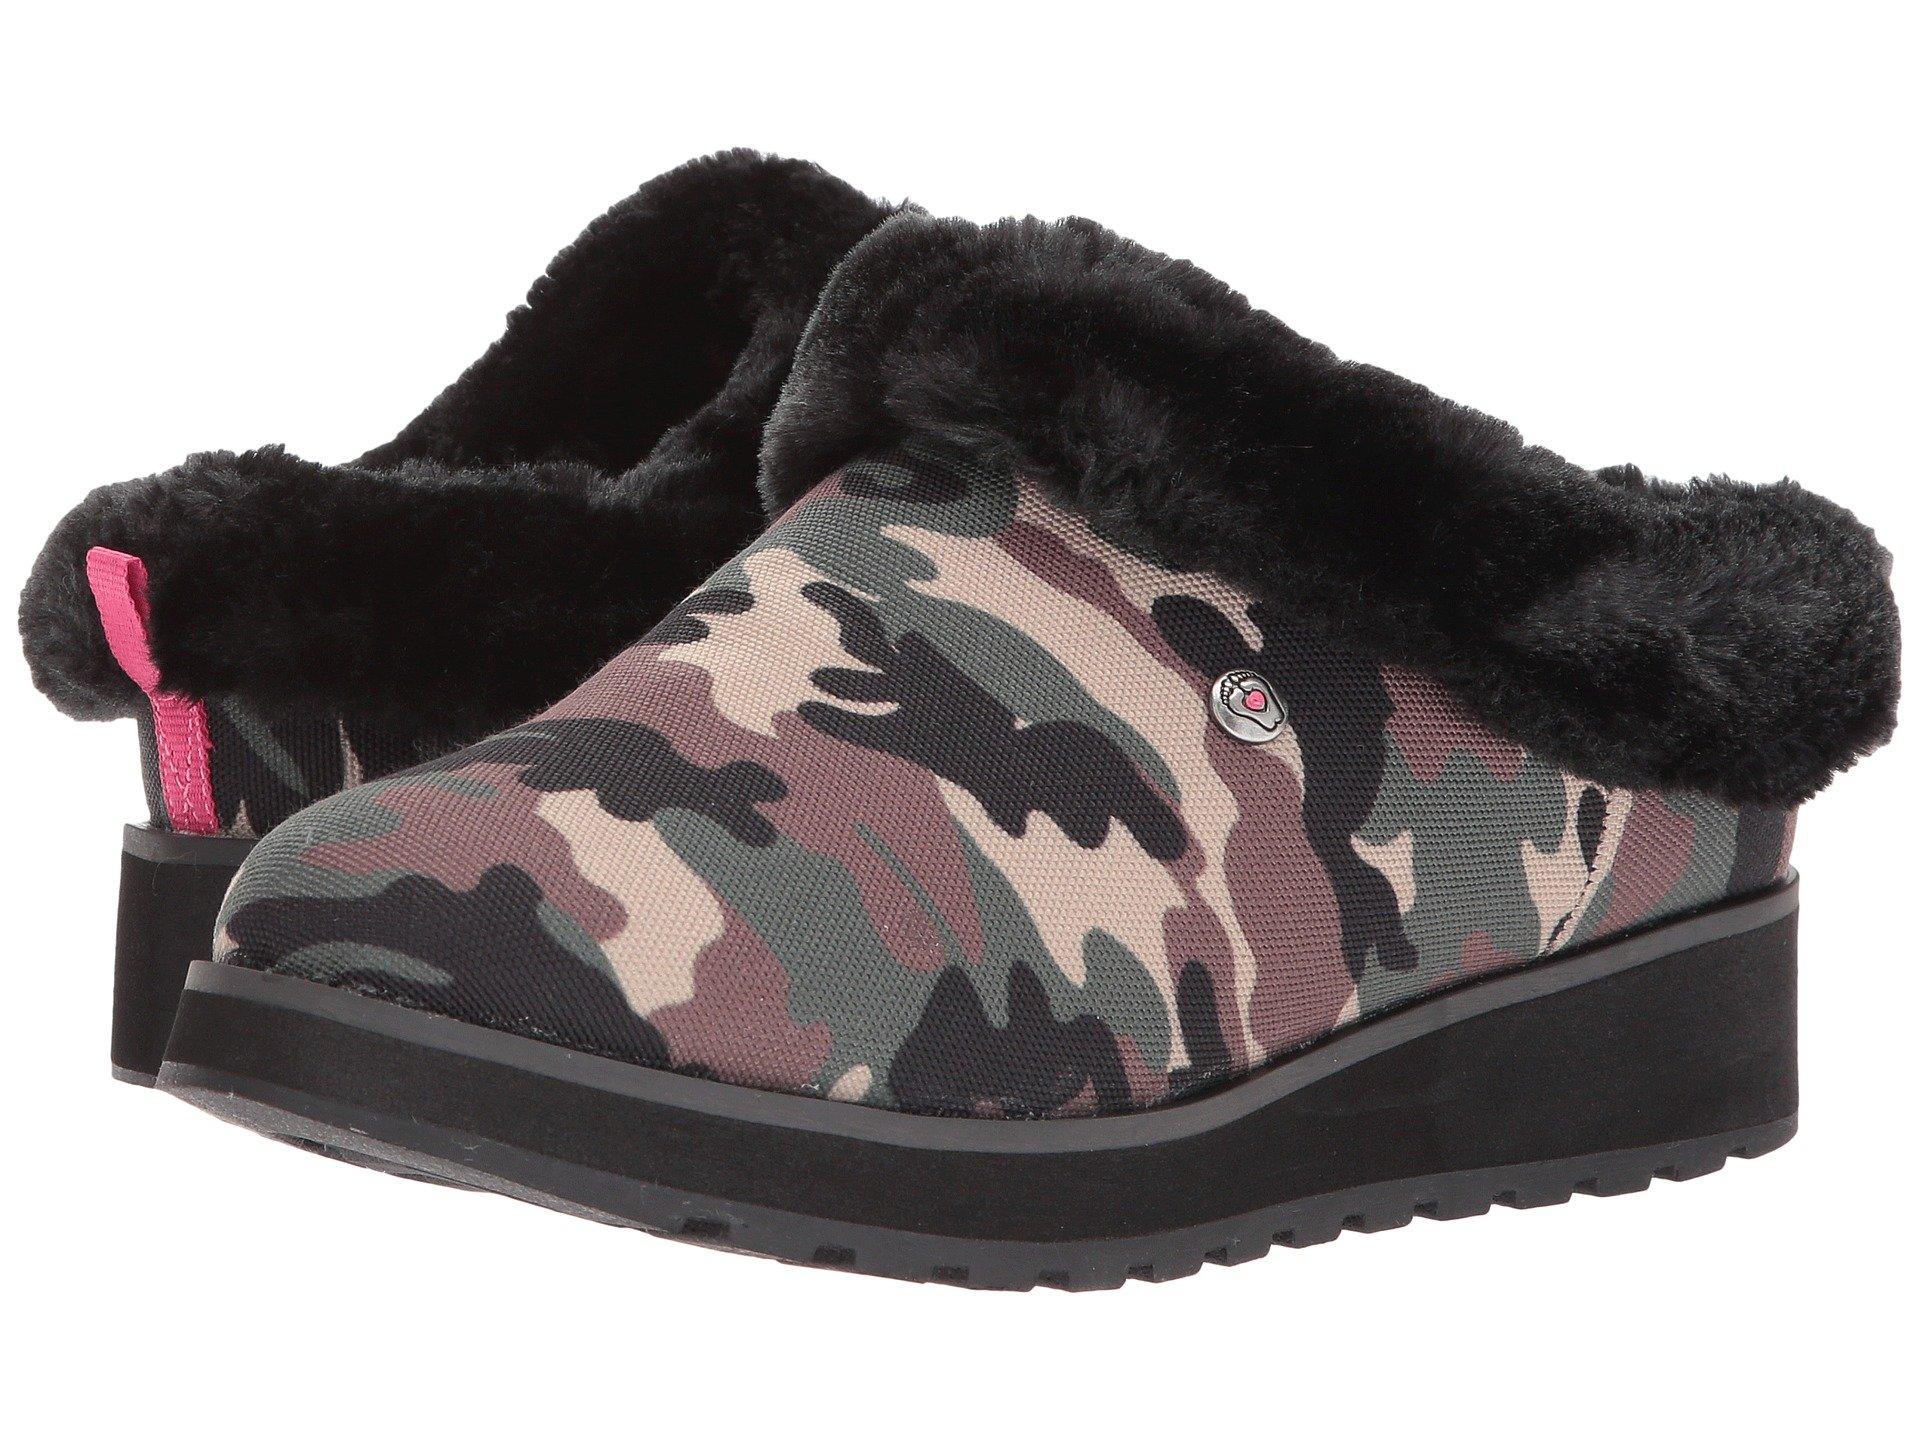 Zapato de Descanso para Mujer BOBS from SKECHERS Keepsakes High-Dream Cadet  + SKECHERS en VeoyCompro.net